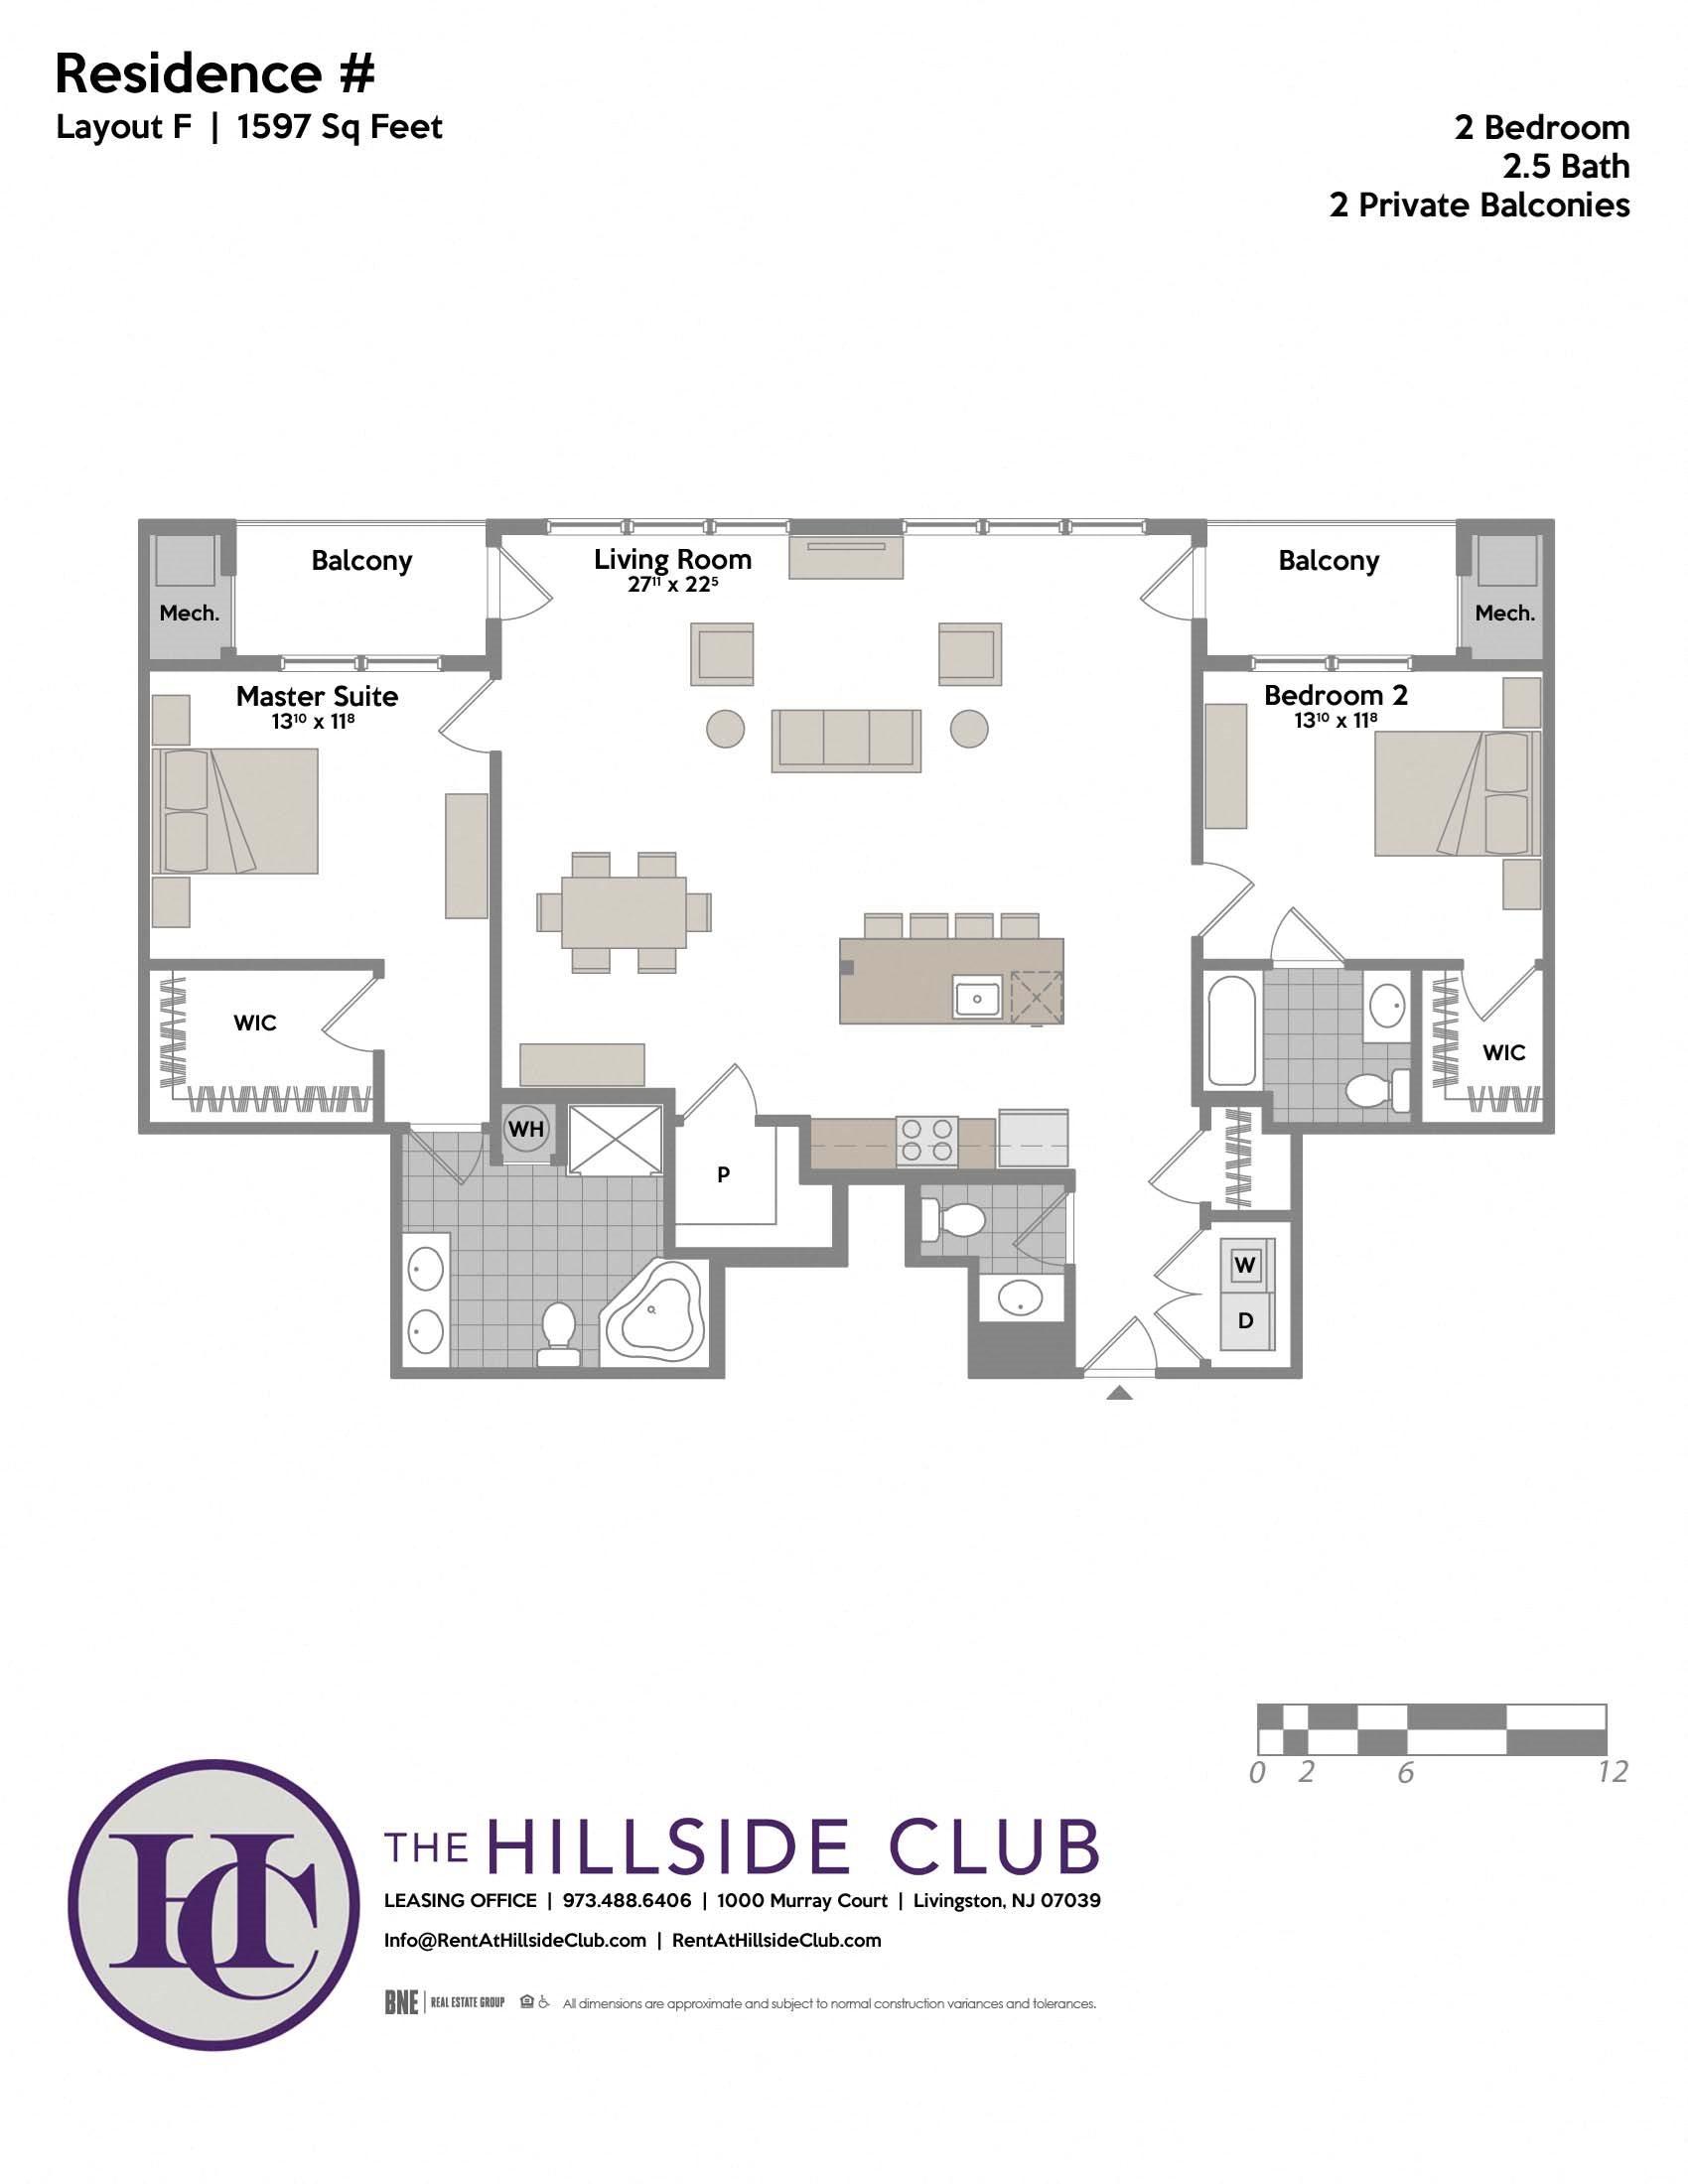 Layout F Floor Plan 1